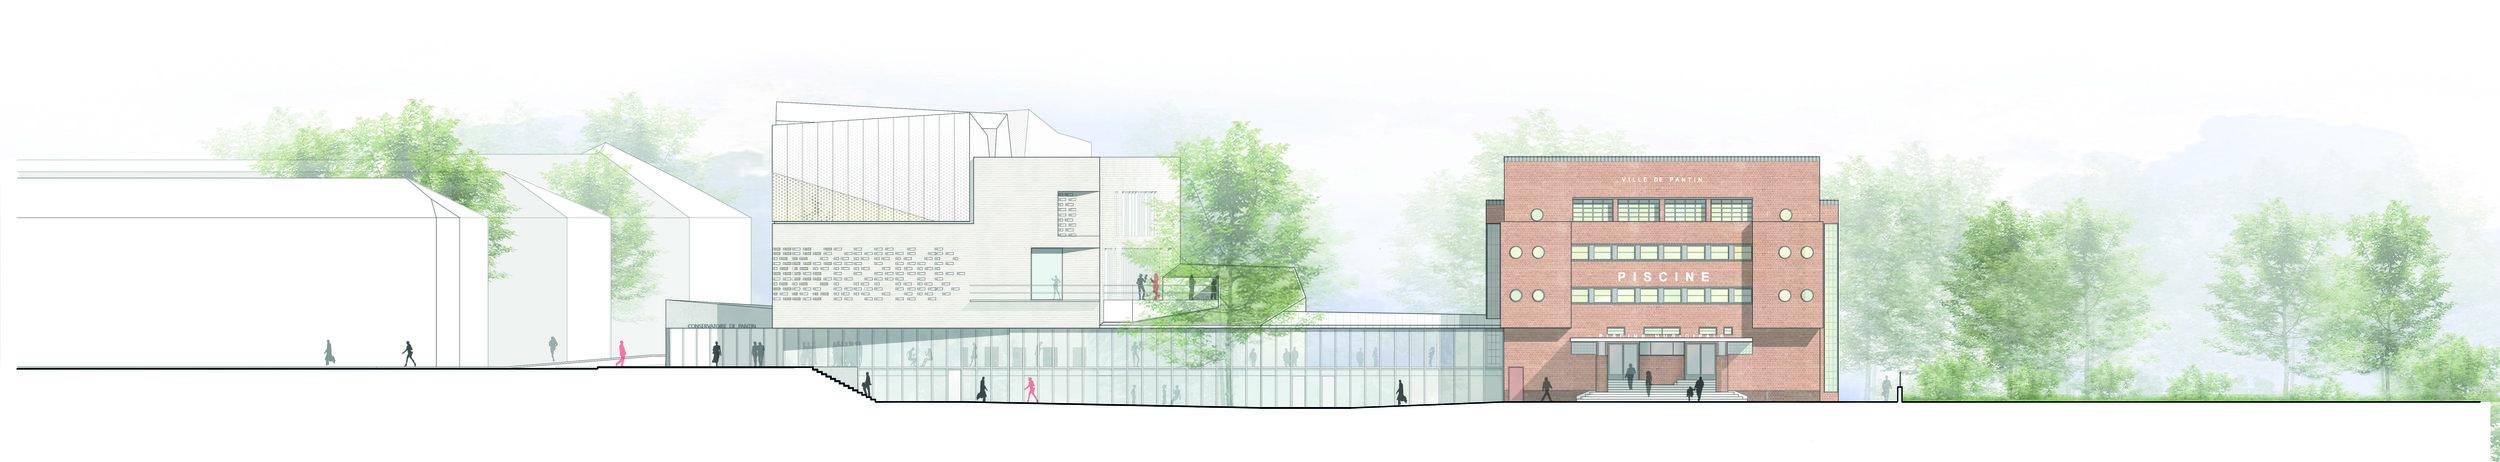 conservatoire_piscine_leclerc_pantin_public_outdoor_design_christophe_gautrand_paysagiste_4.jpg